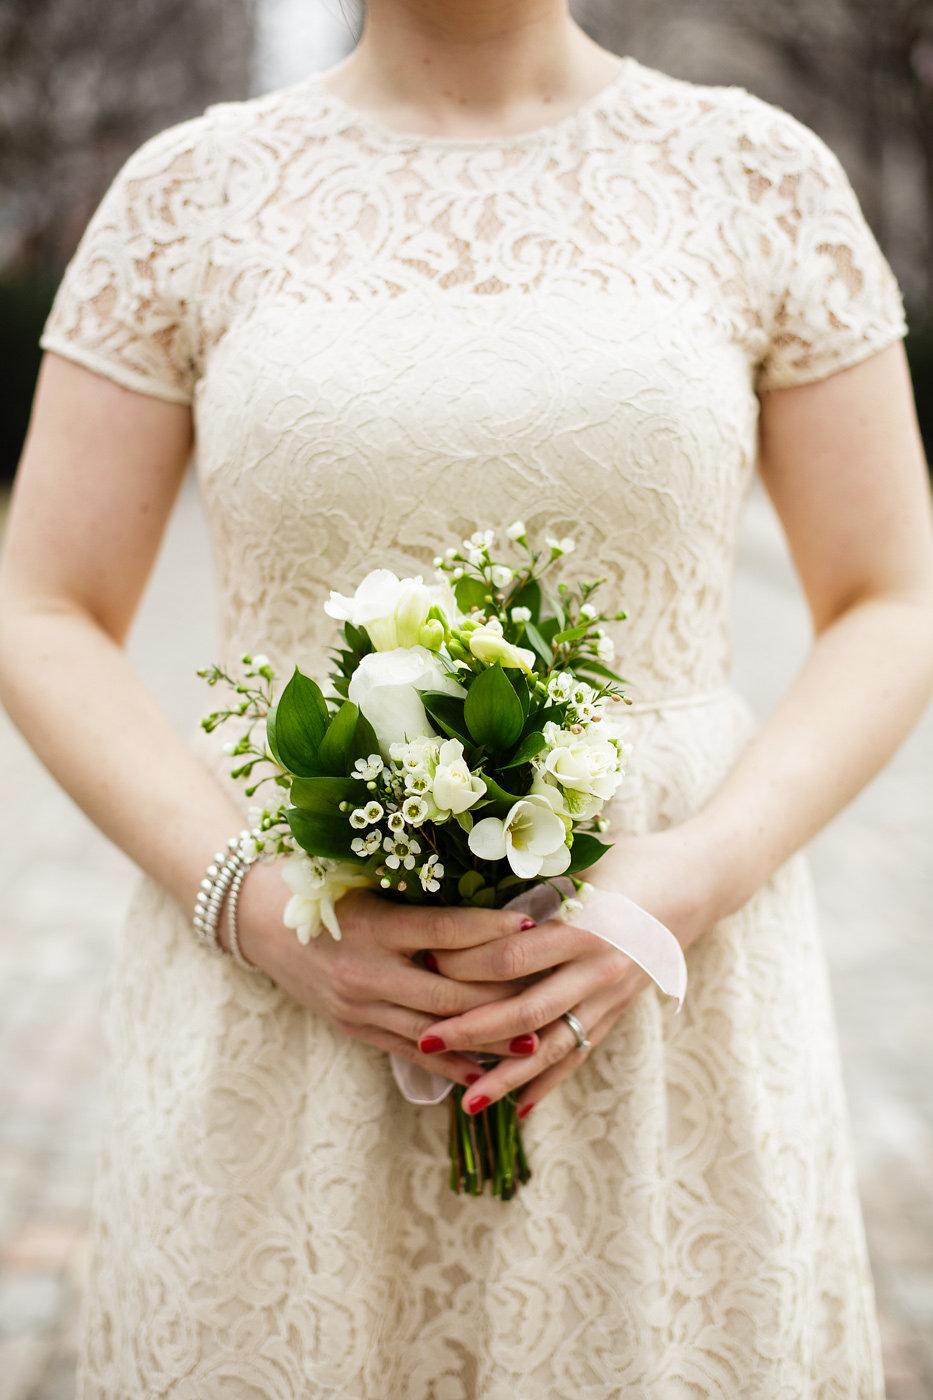 jessicahoang-emal-toronto-city-hall-wedding-20